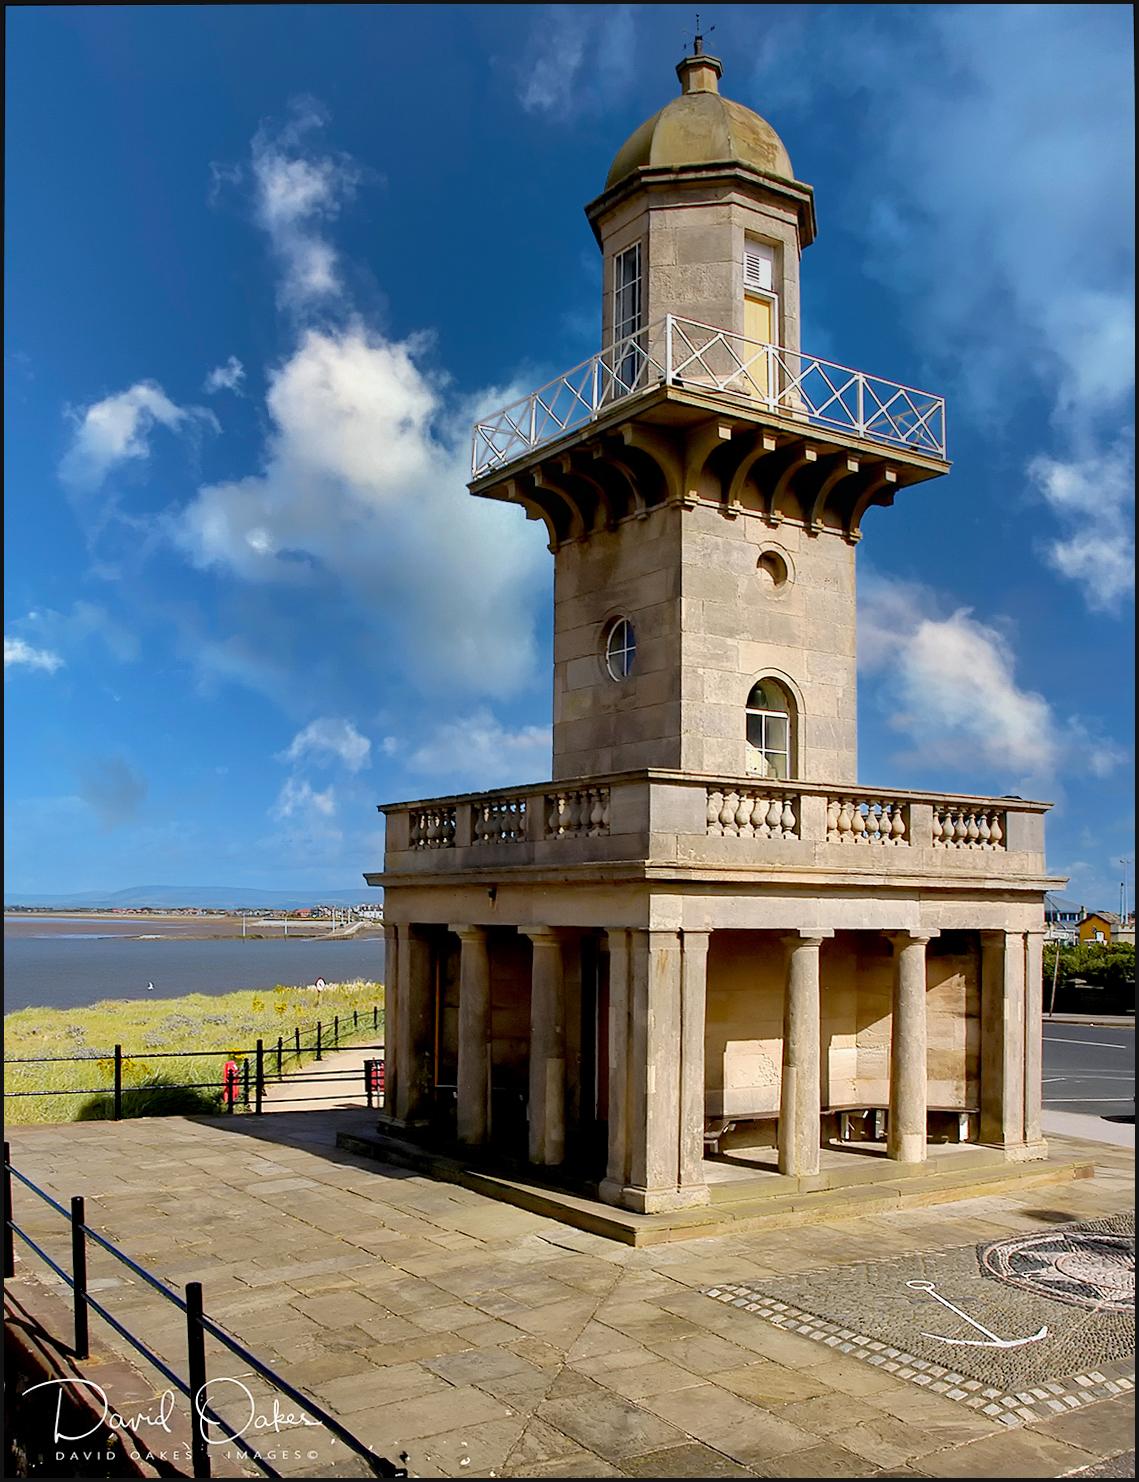 The-Lower-Lighthouse,-Fleetwood,-Lancashire